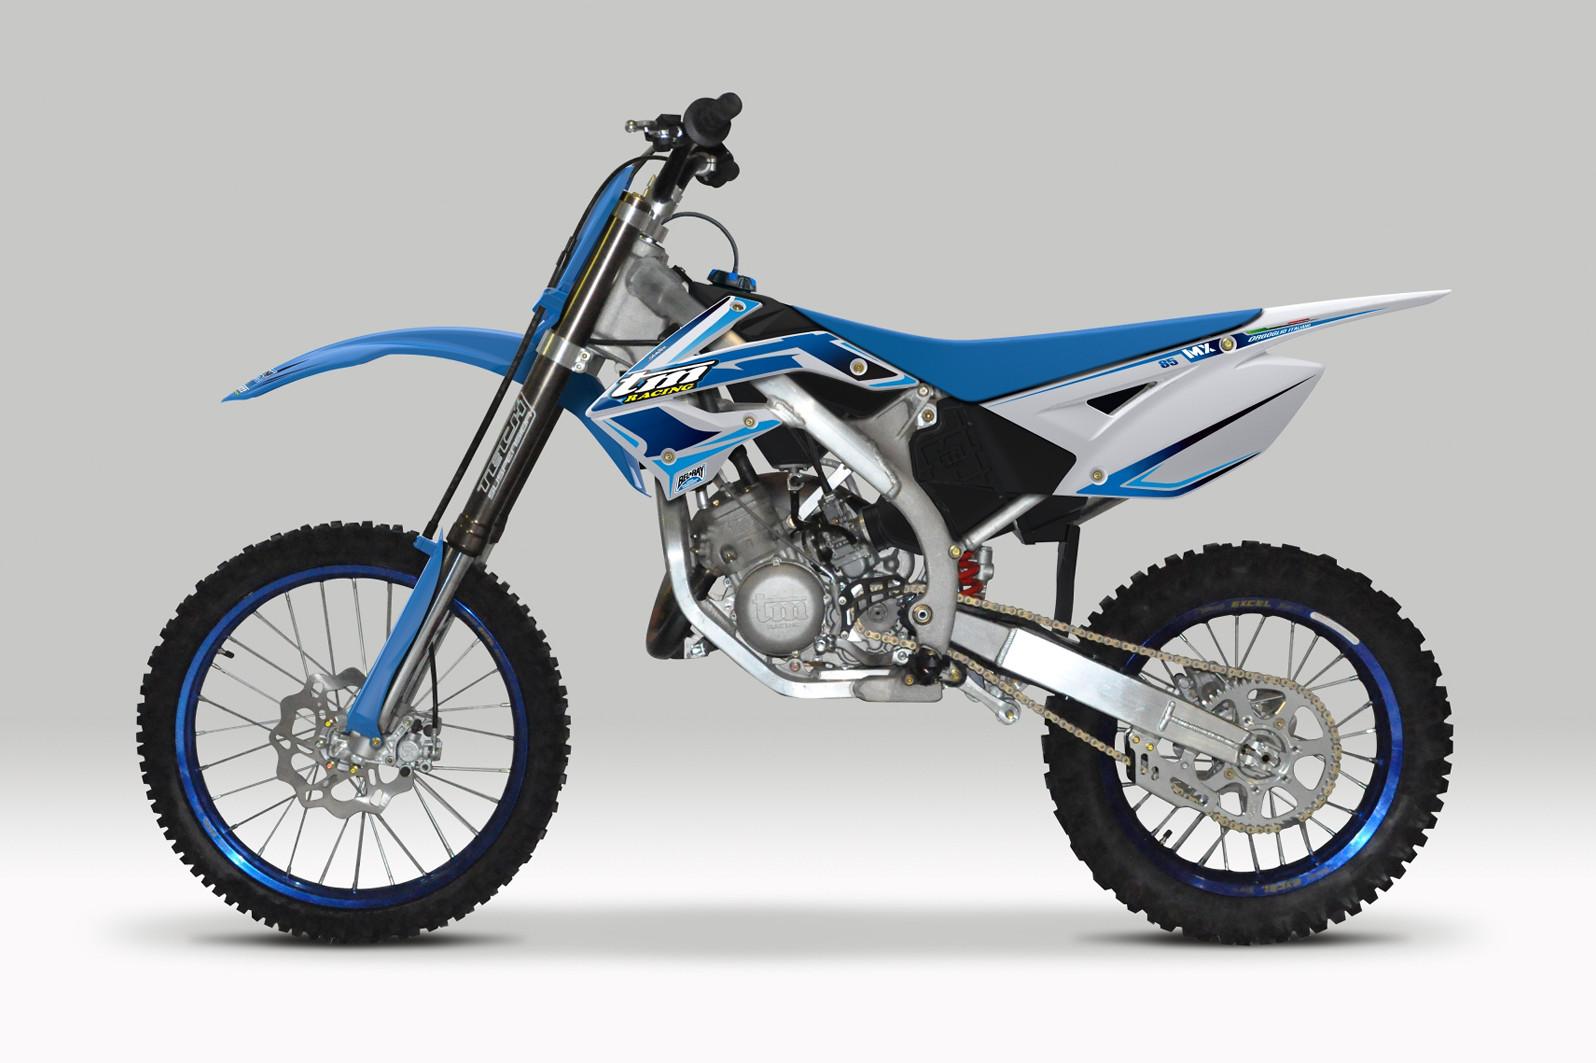 2013 Tm Racing Mx 100 Junior Reviews Comparisons Specs